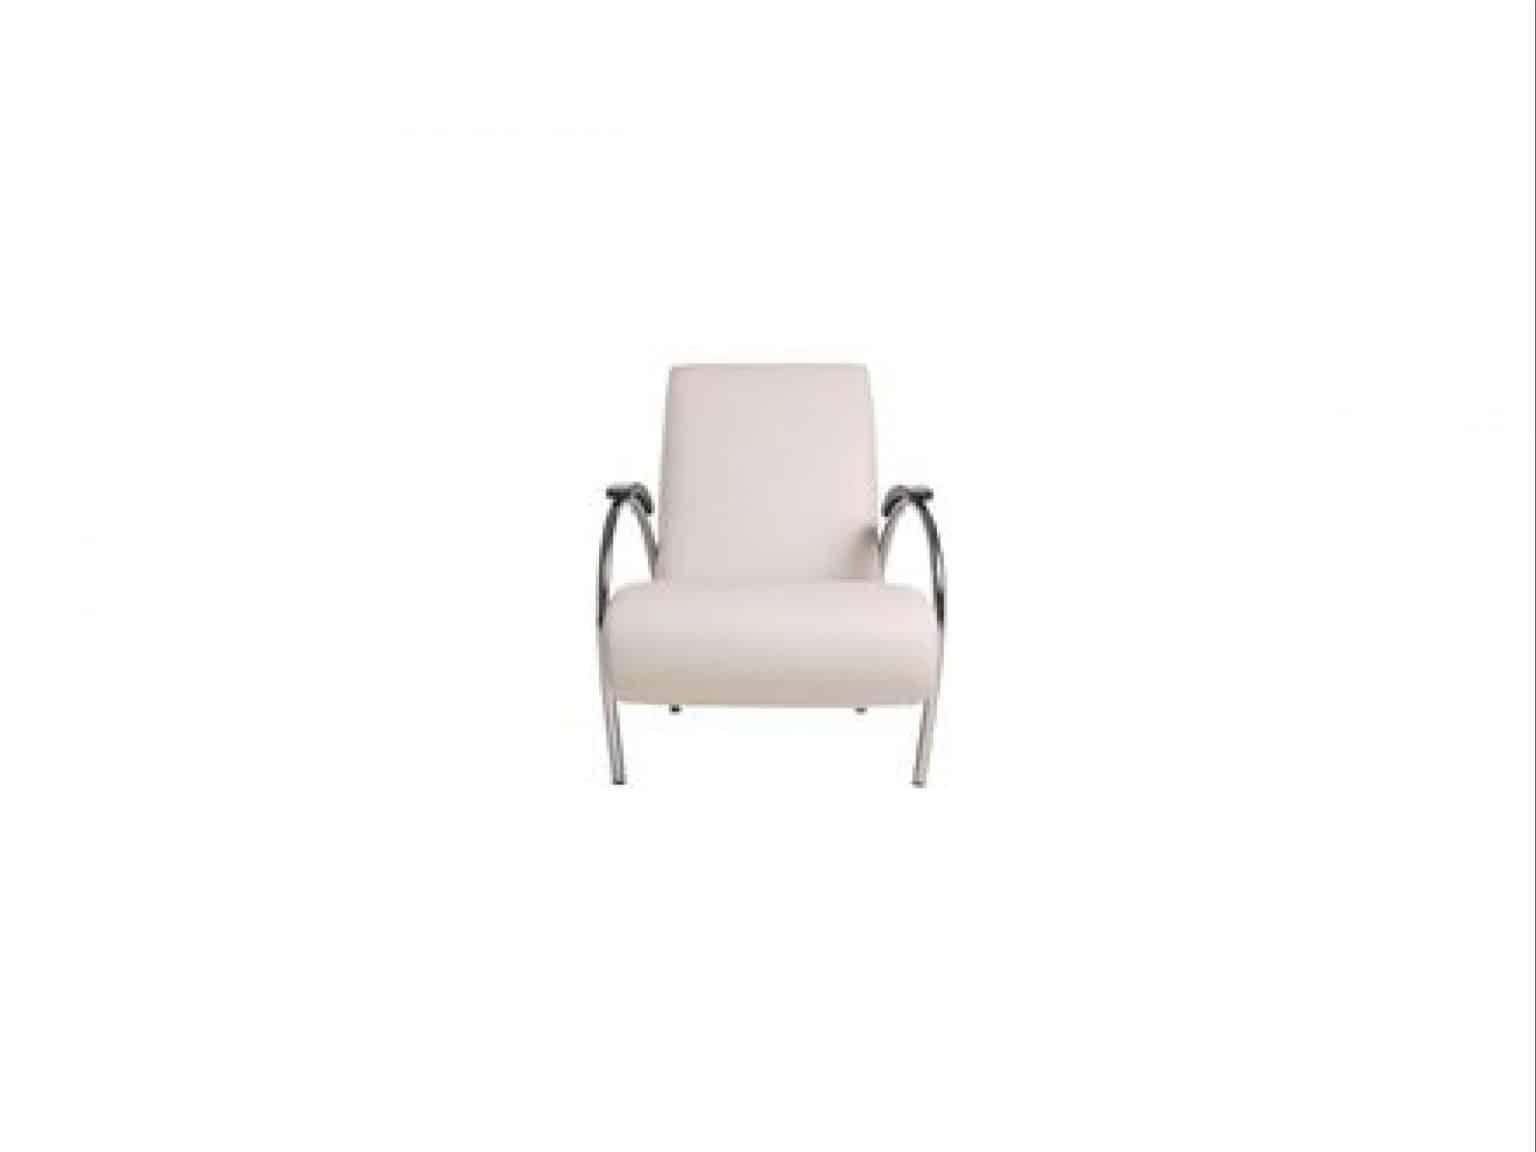 Gelderland fauteuil 5770 pa